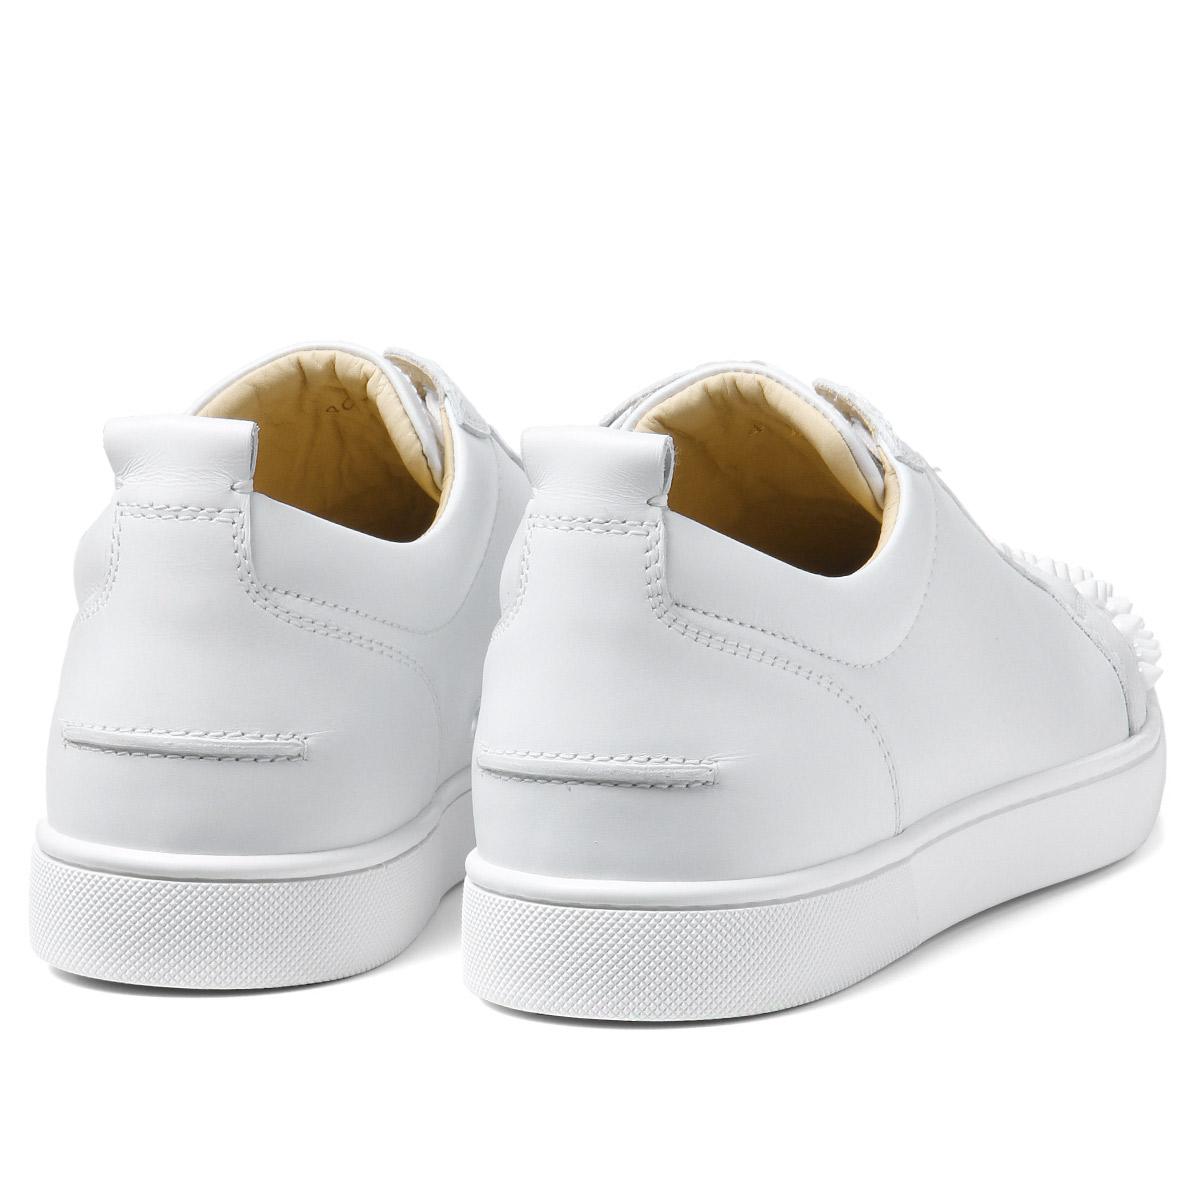 86de2df2c11 1130573 クリスチャンルブタン Christian Louboutin shoes men 3047 sneakers LOUIS JUNIOR  SPIKES FLAT Lewis Junius pike staple fiber rat WHITE/WHITE white